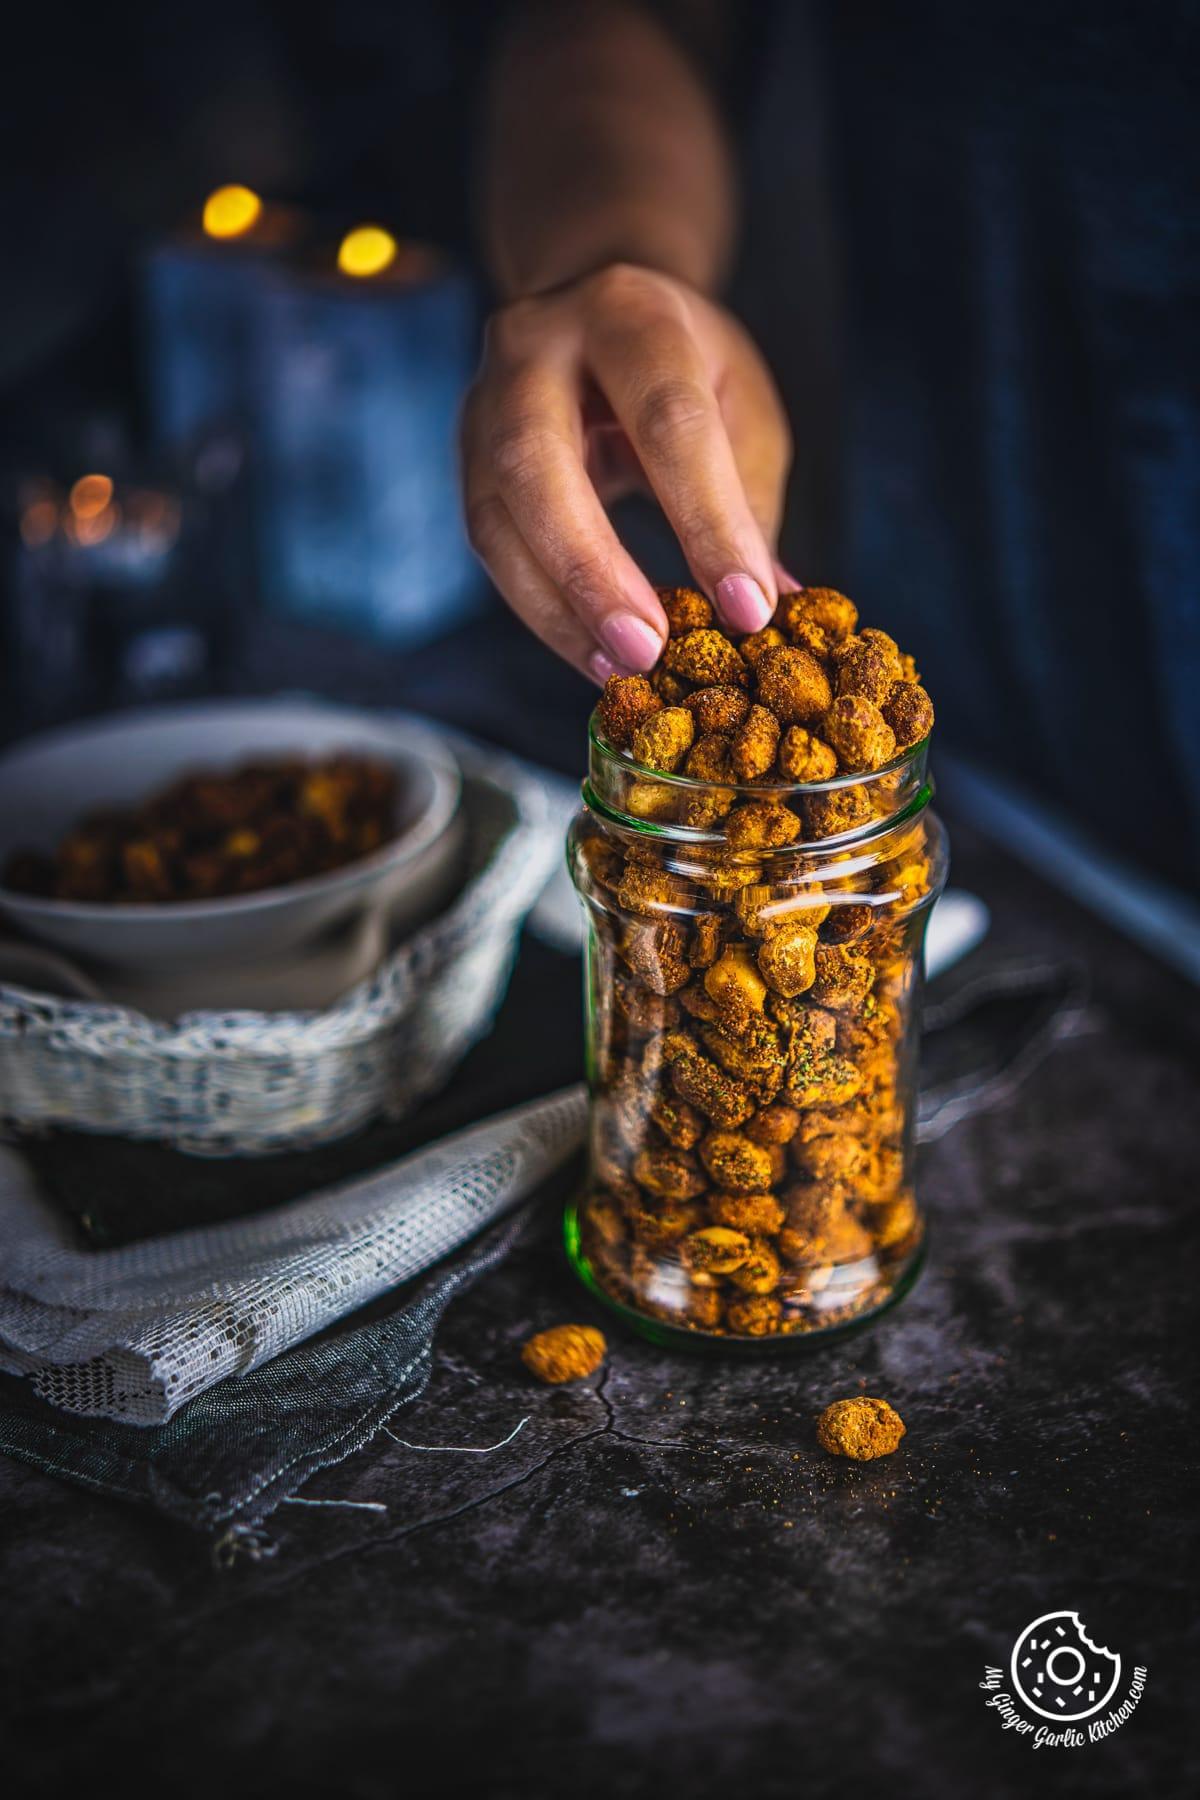 a hand picking masala peanut from a transparent jar